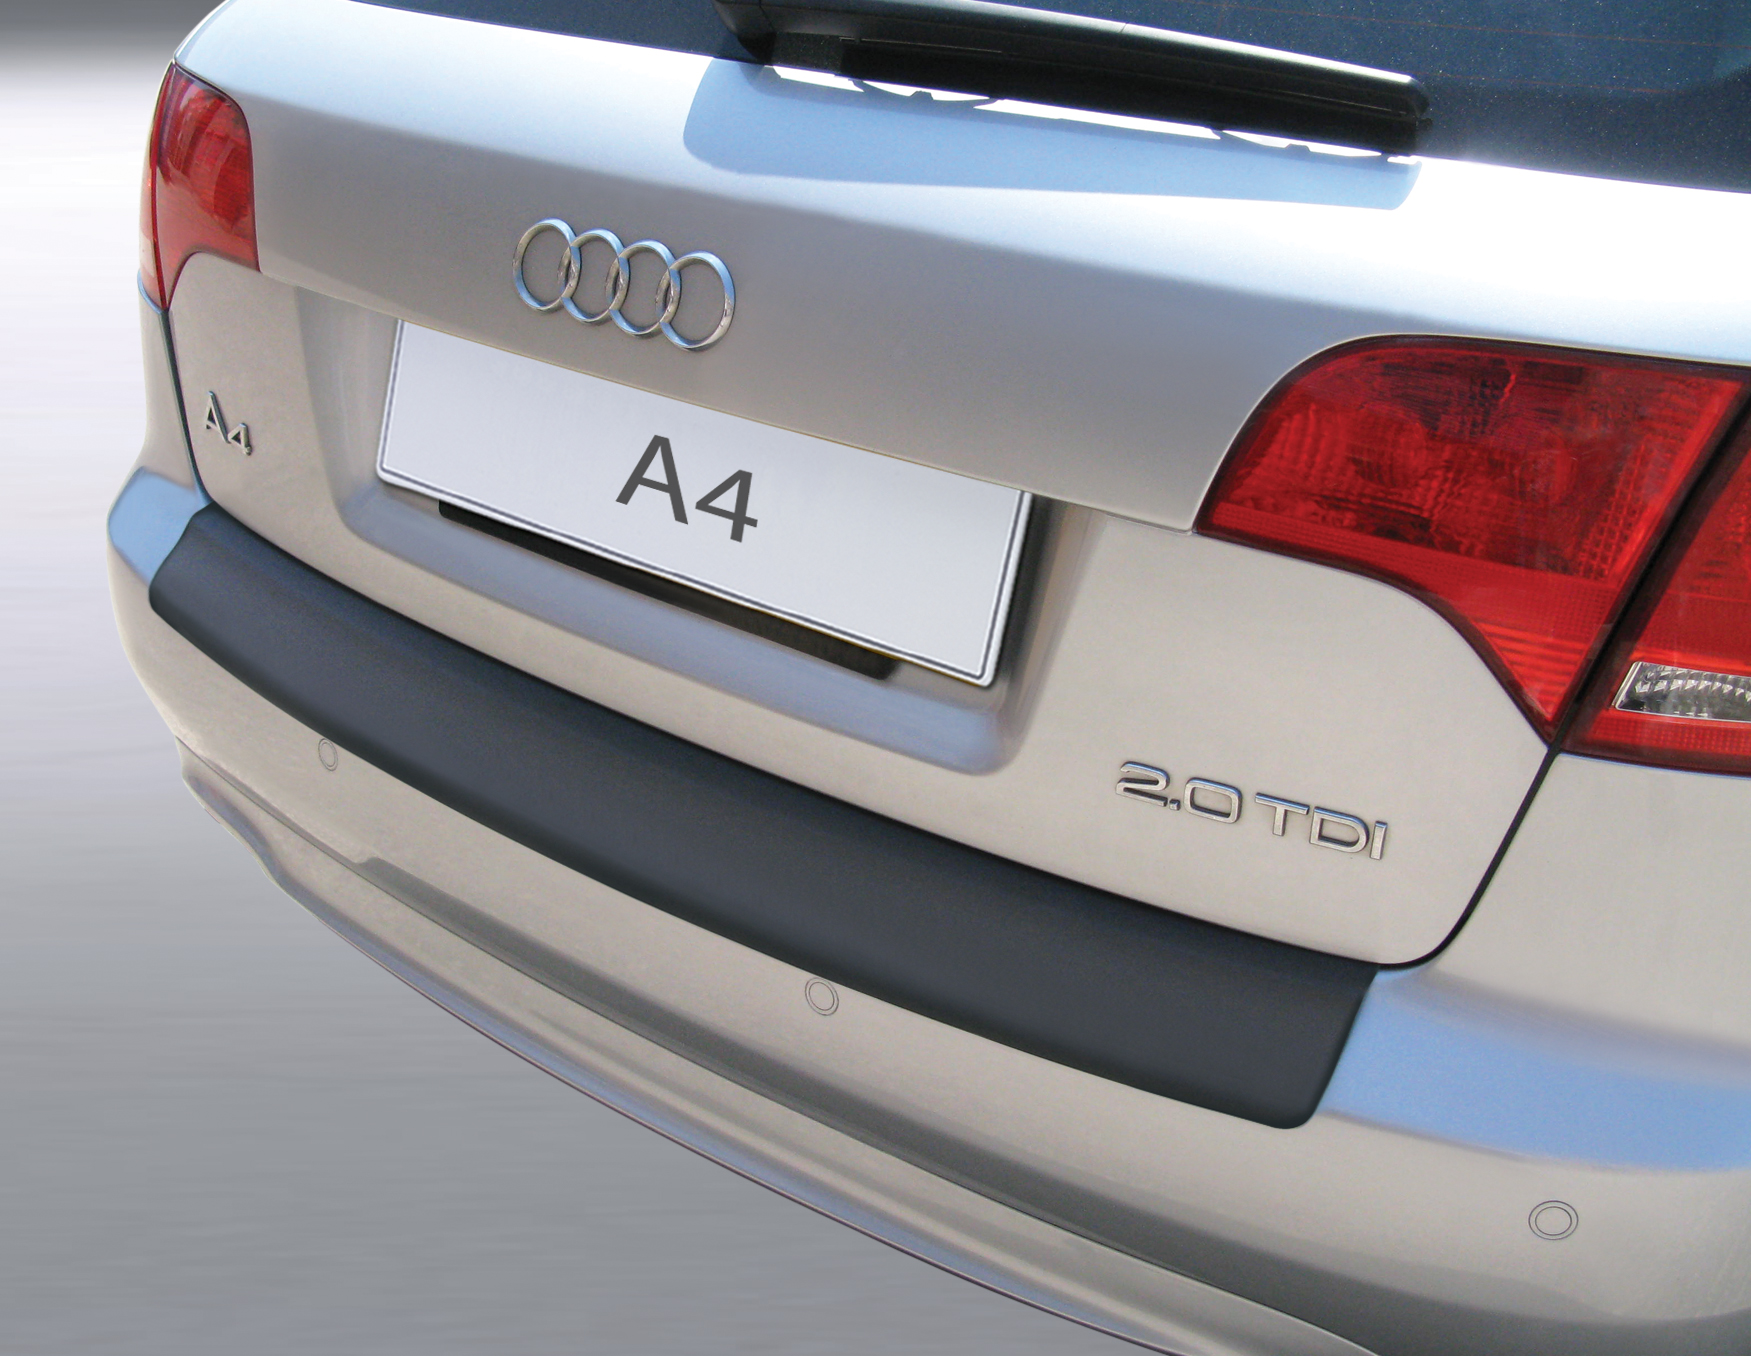 Накладка на задний бампер Audi A4 Avant, Ауди А4 универсал, 2004-2008